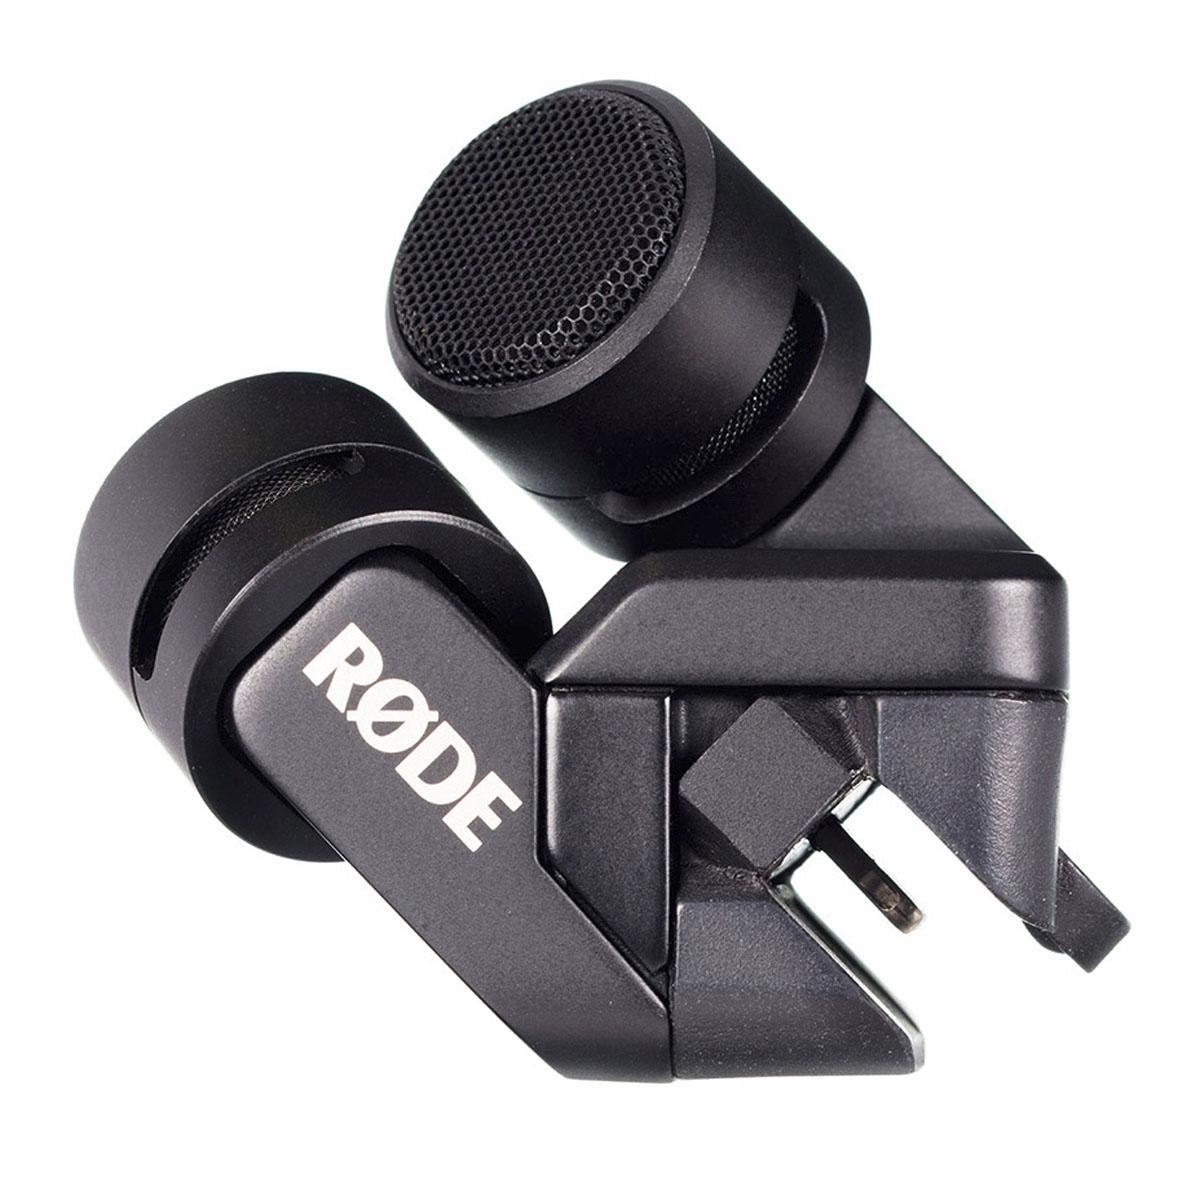 Rode i-XY 5 Lightning Aufsteck Stereo Mikrofon